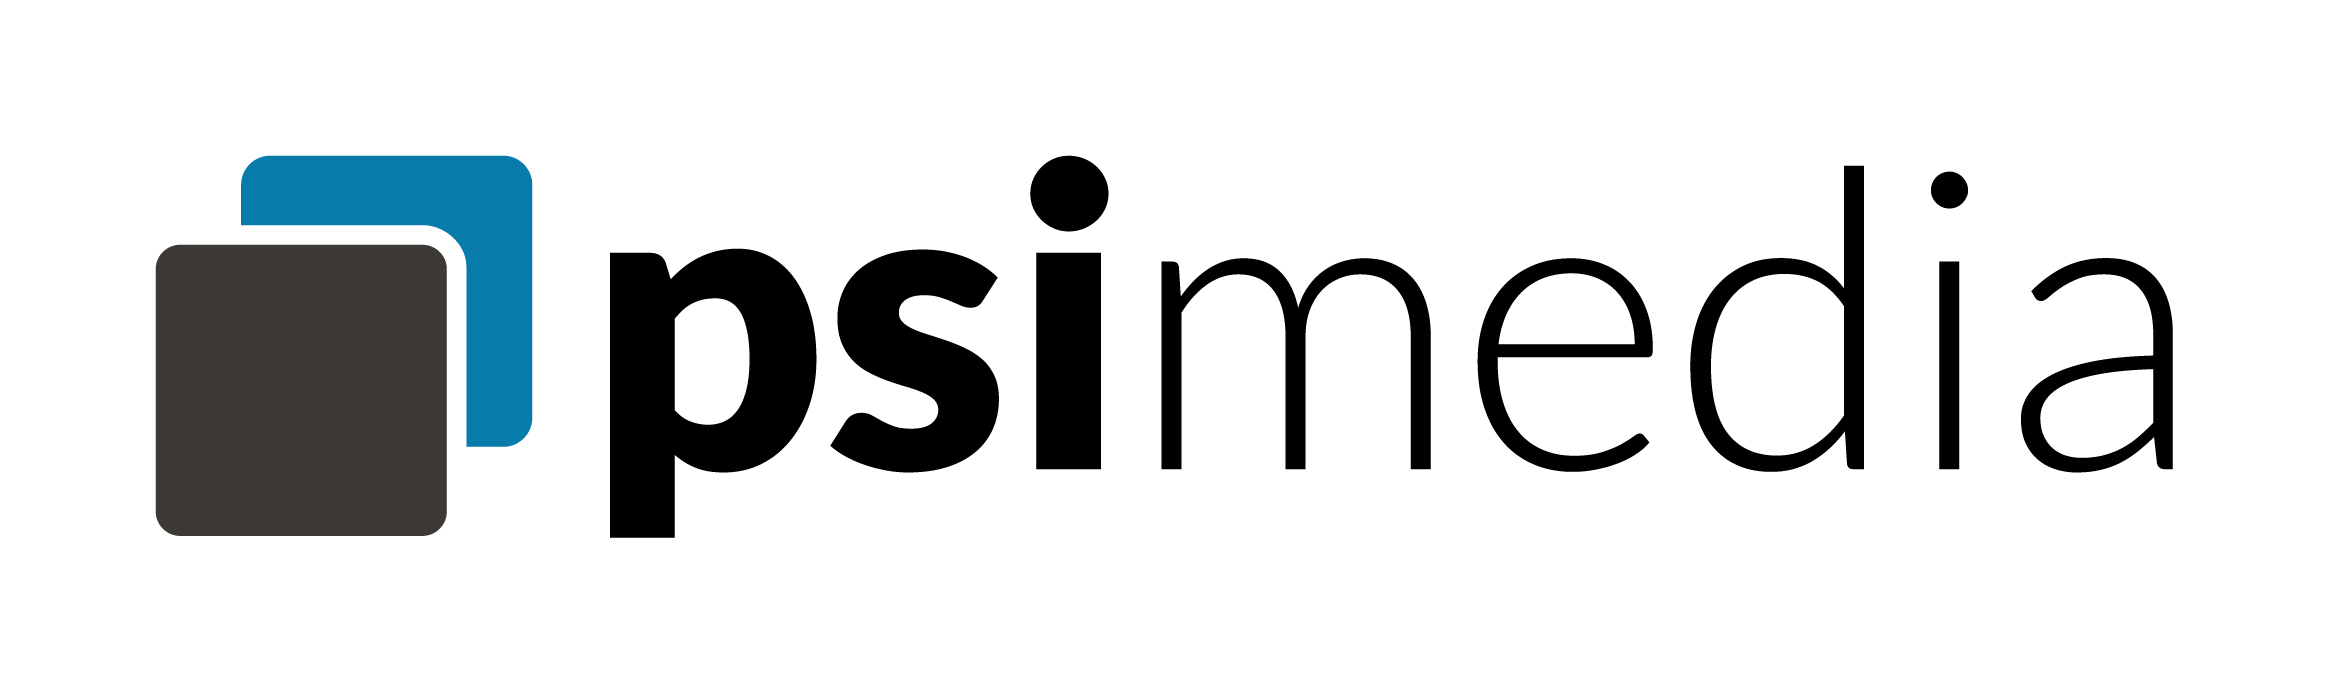 PSImedia